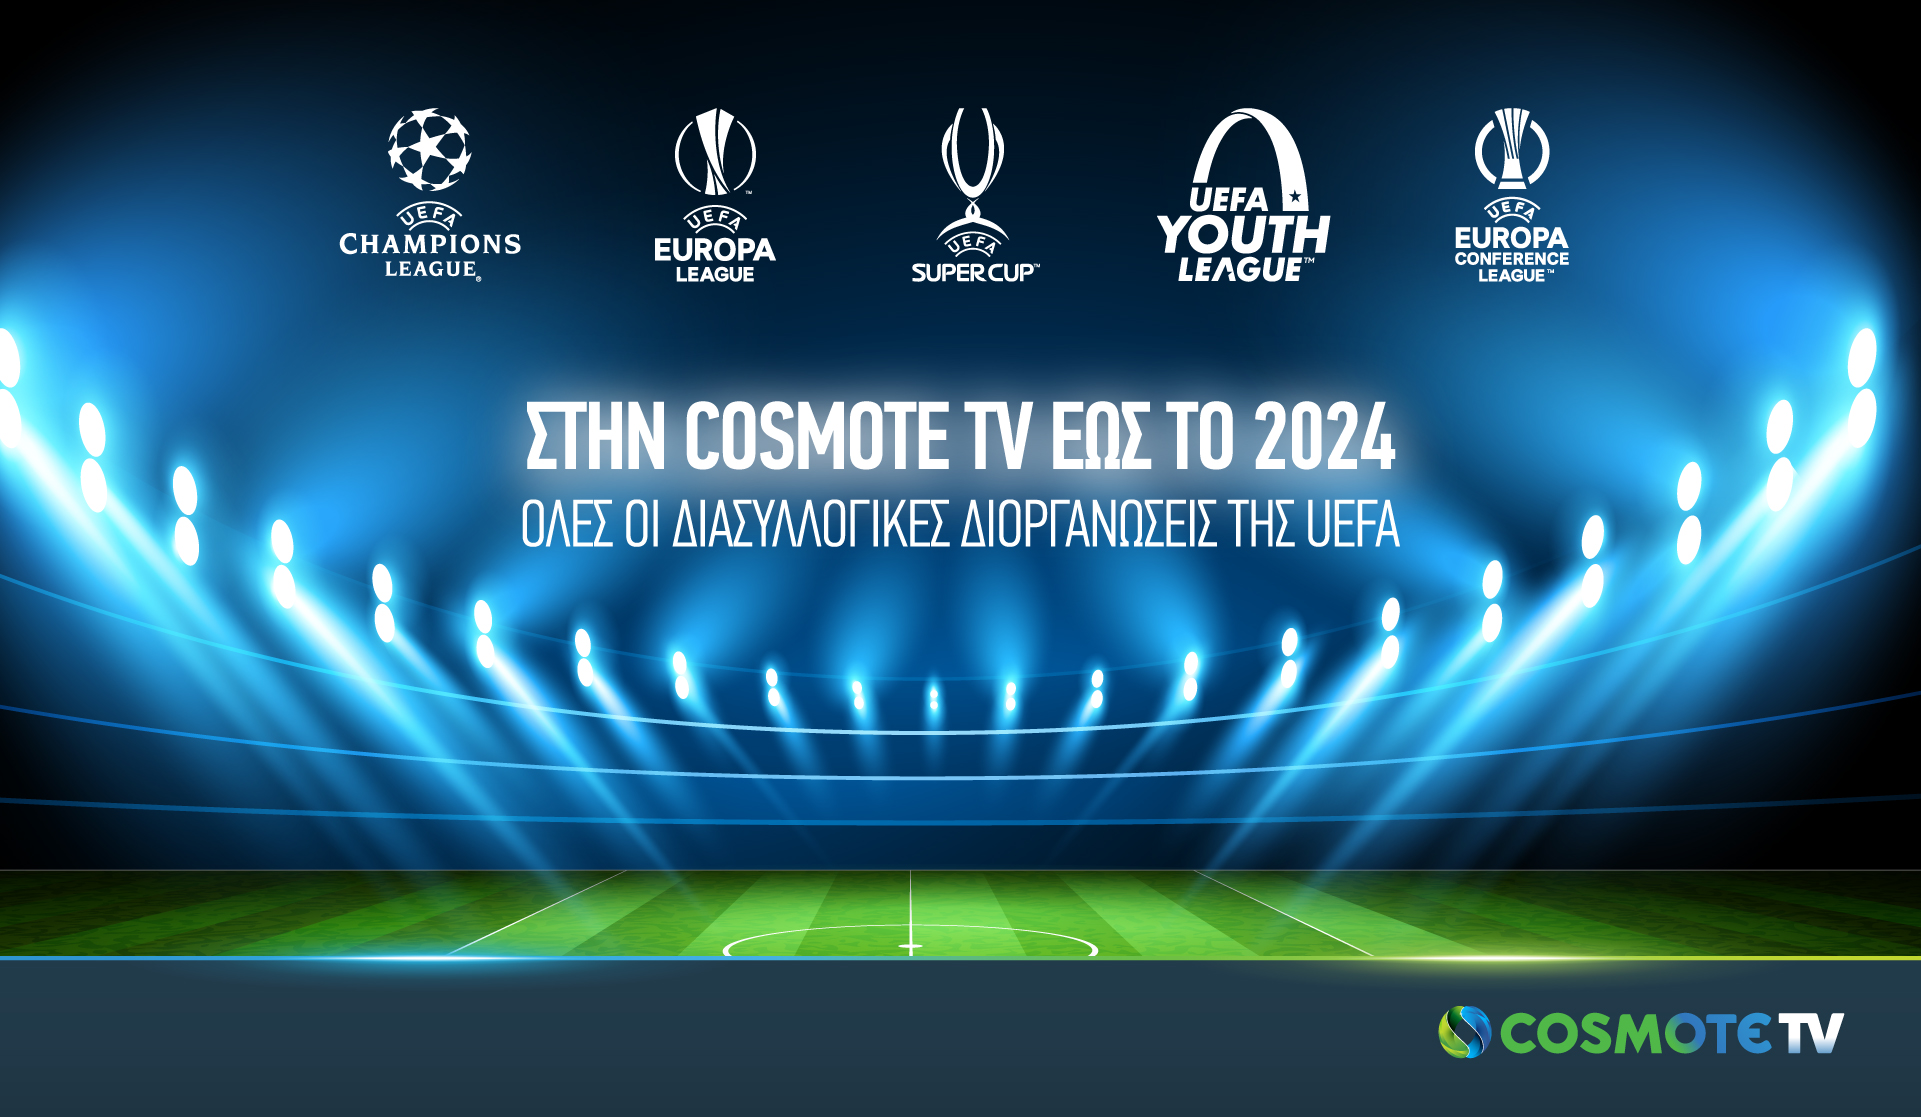 Cosmote TV, προβάδισμα στην ως το 2024!